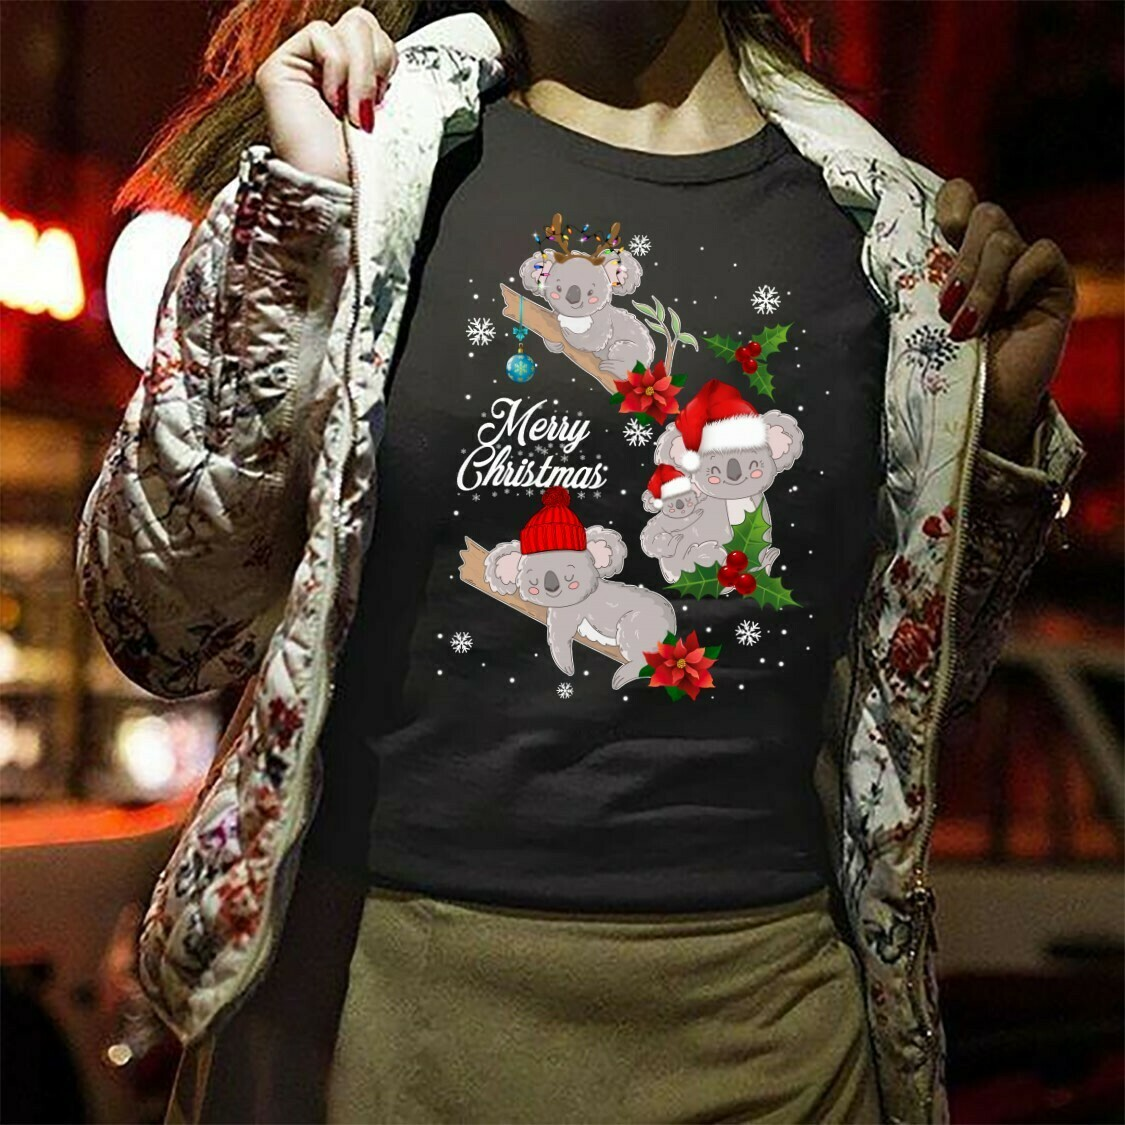 merru christmas Koala Long Sleeve Sweatshirt Hoodie Jolly Family Gifts